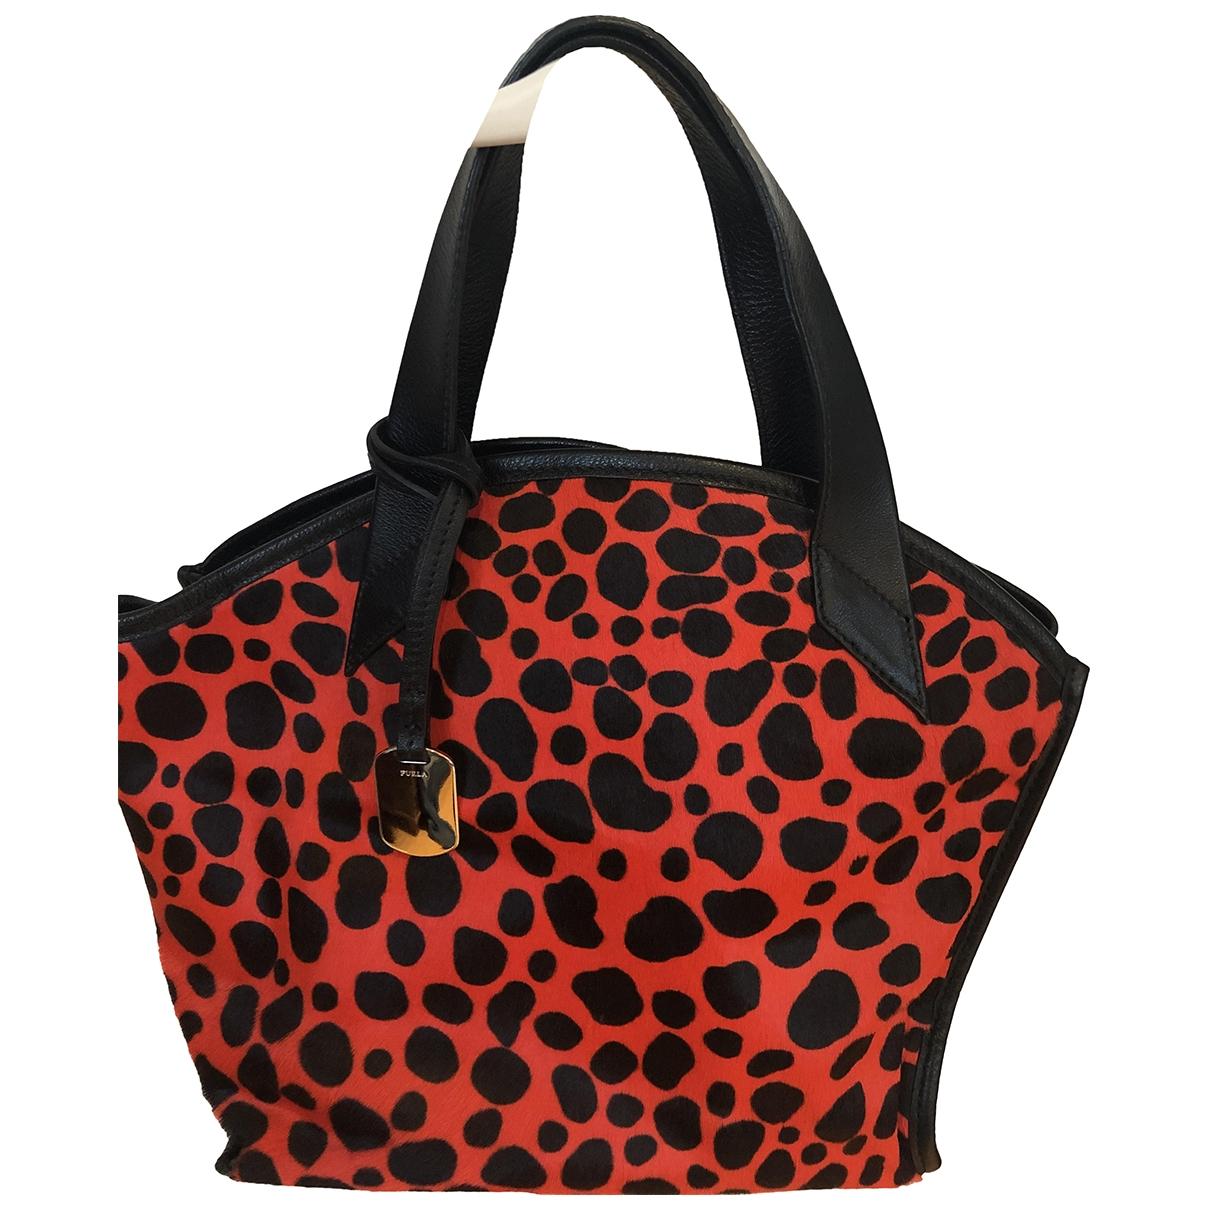 Furla \N Red Pony-style calfskin handbag for Women \N